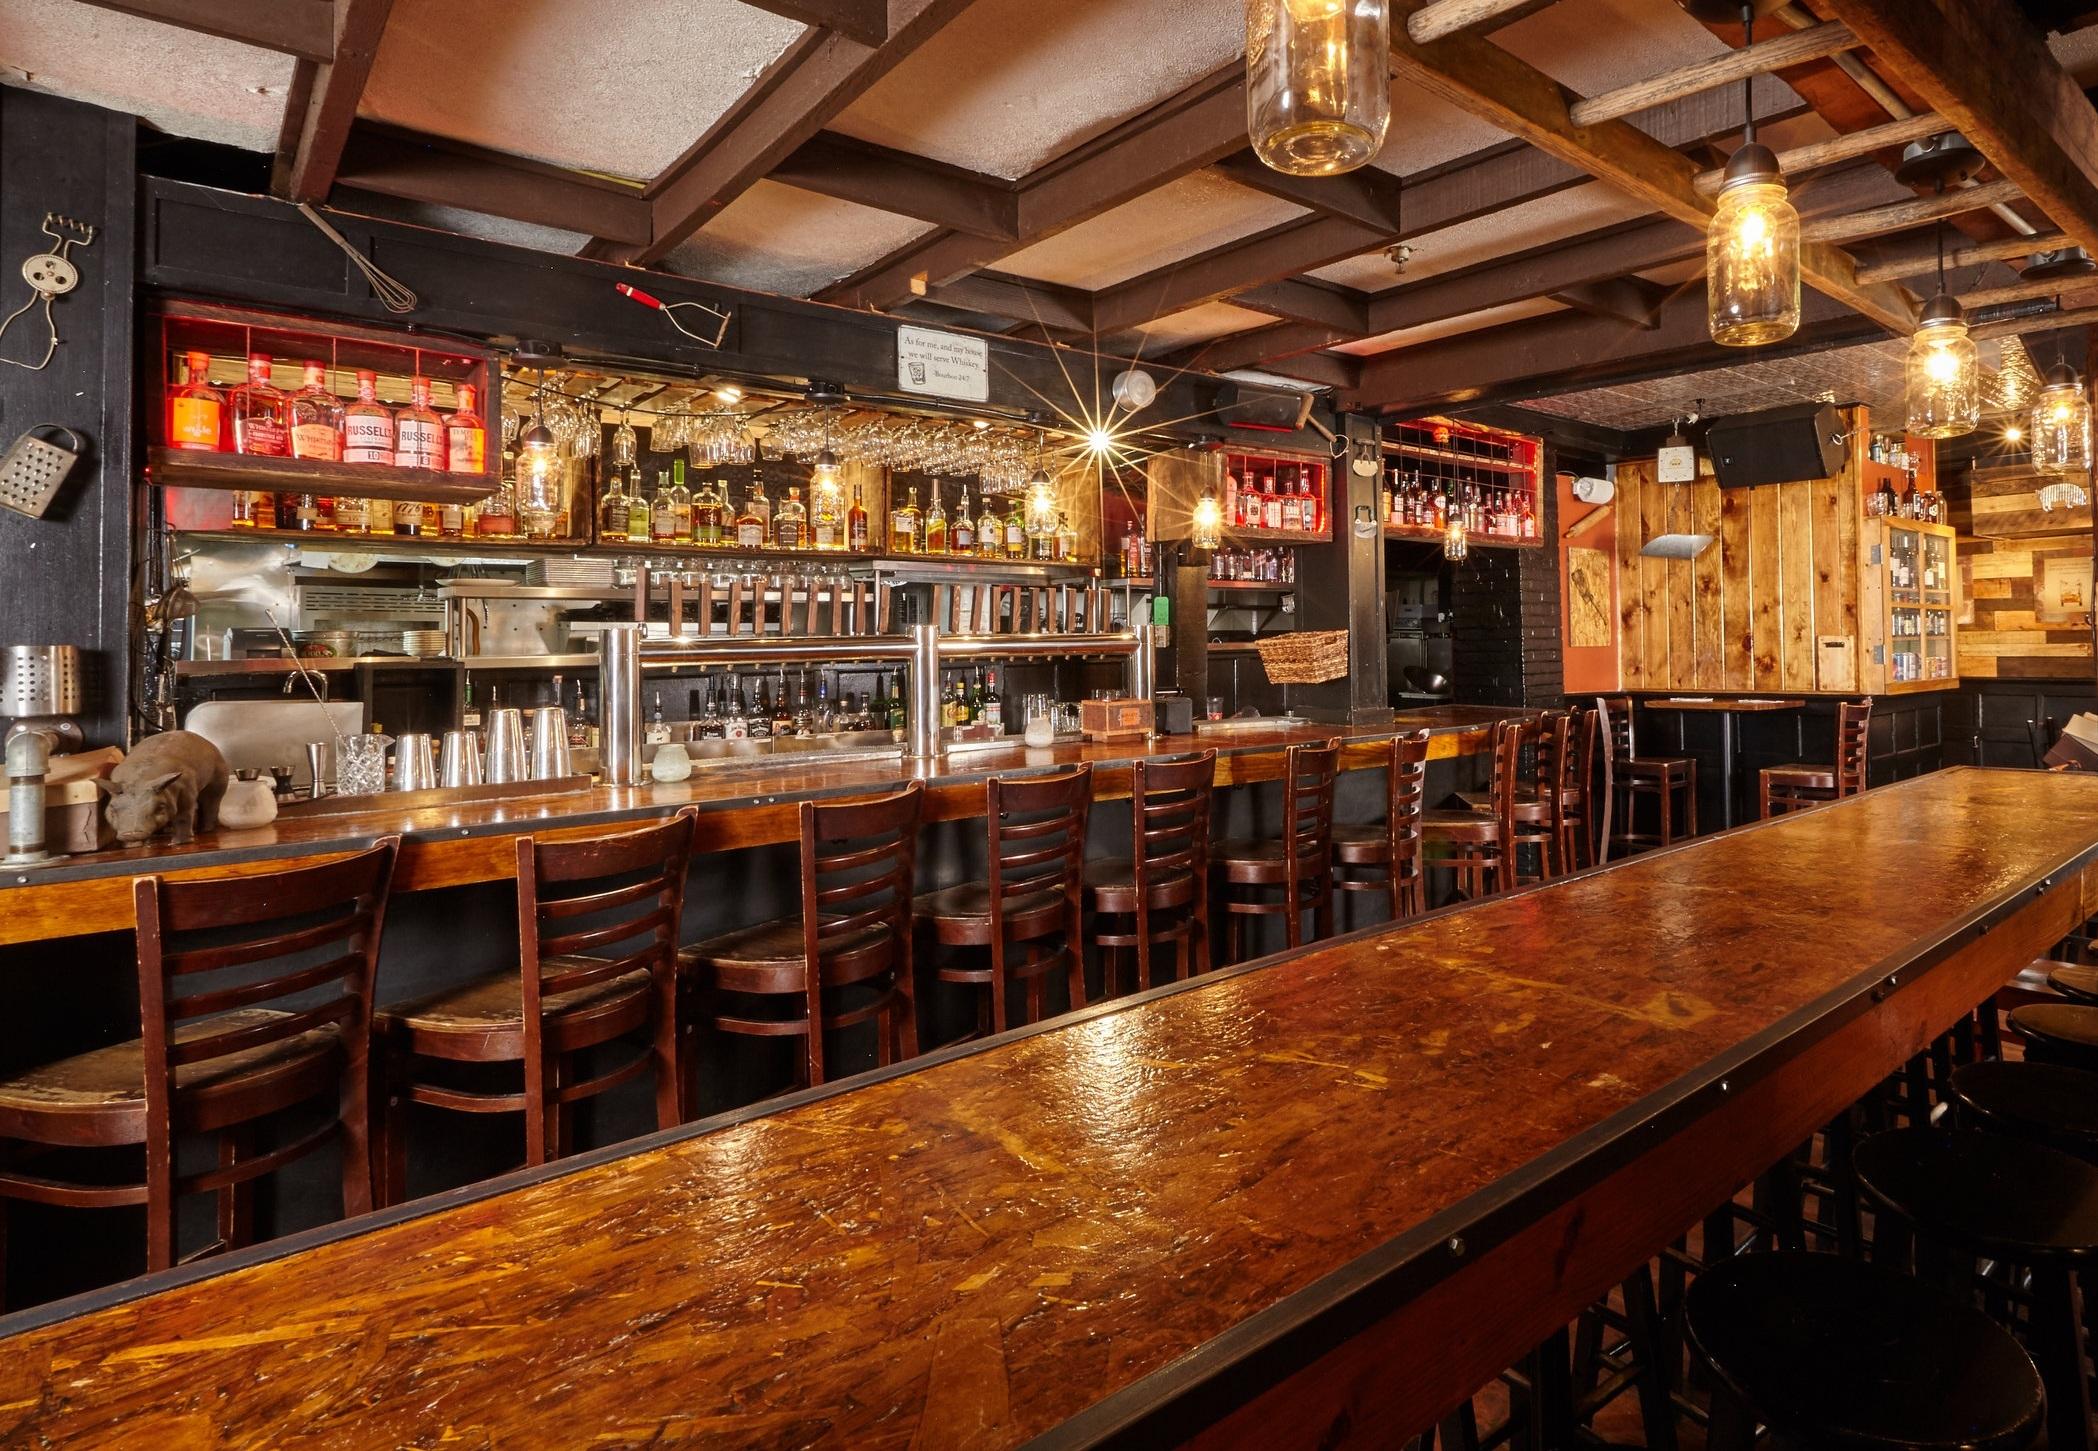 Image via Wharf Southern Kitchen & Whiskey Bar.